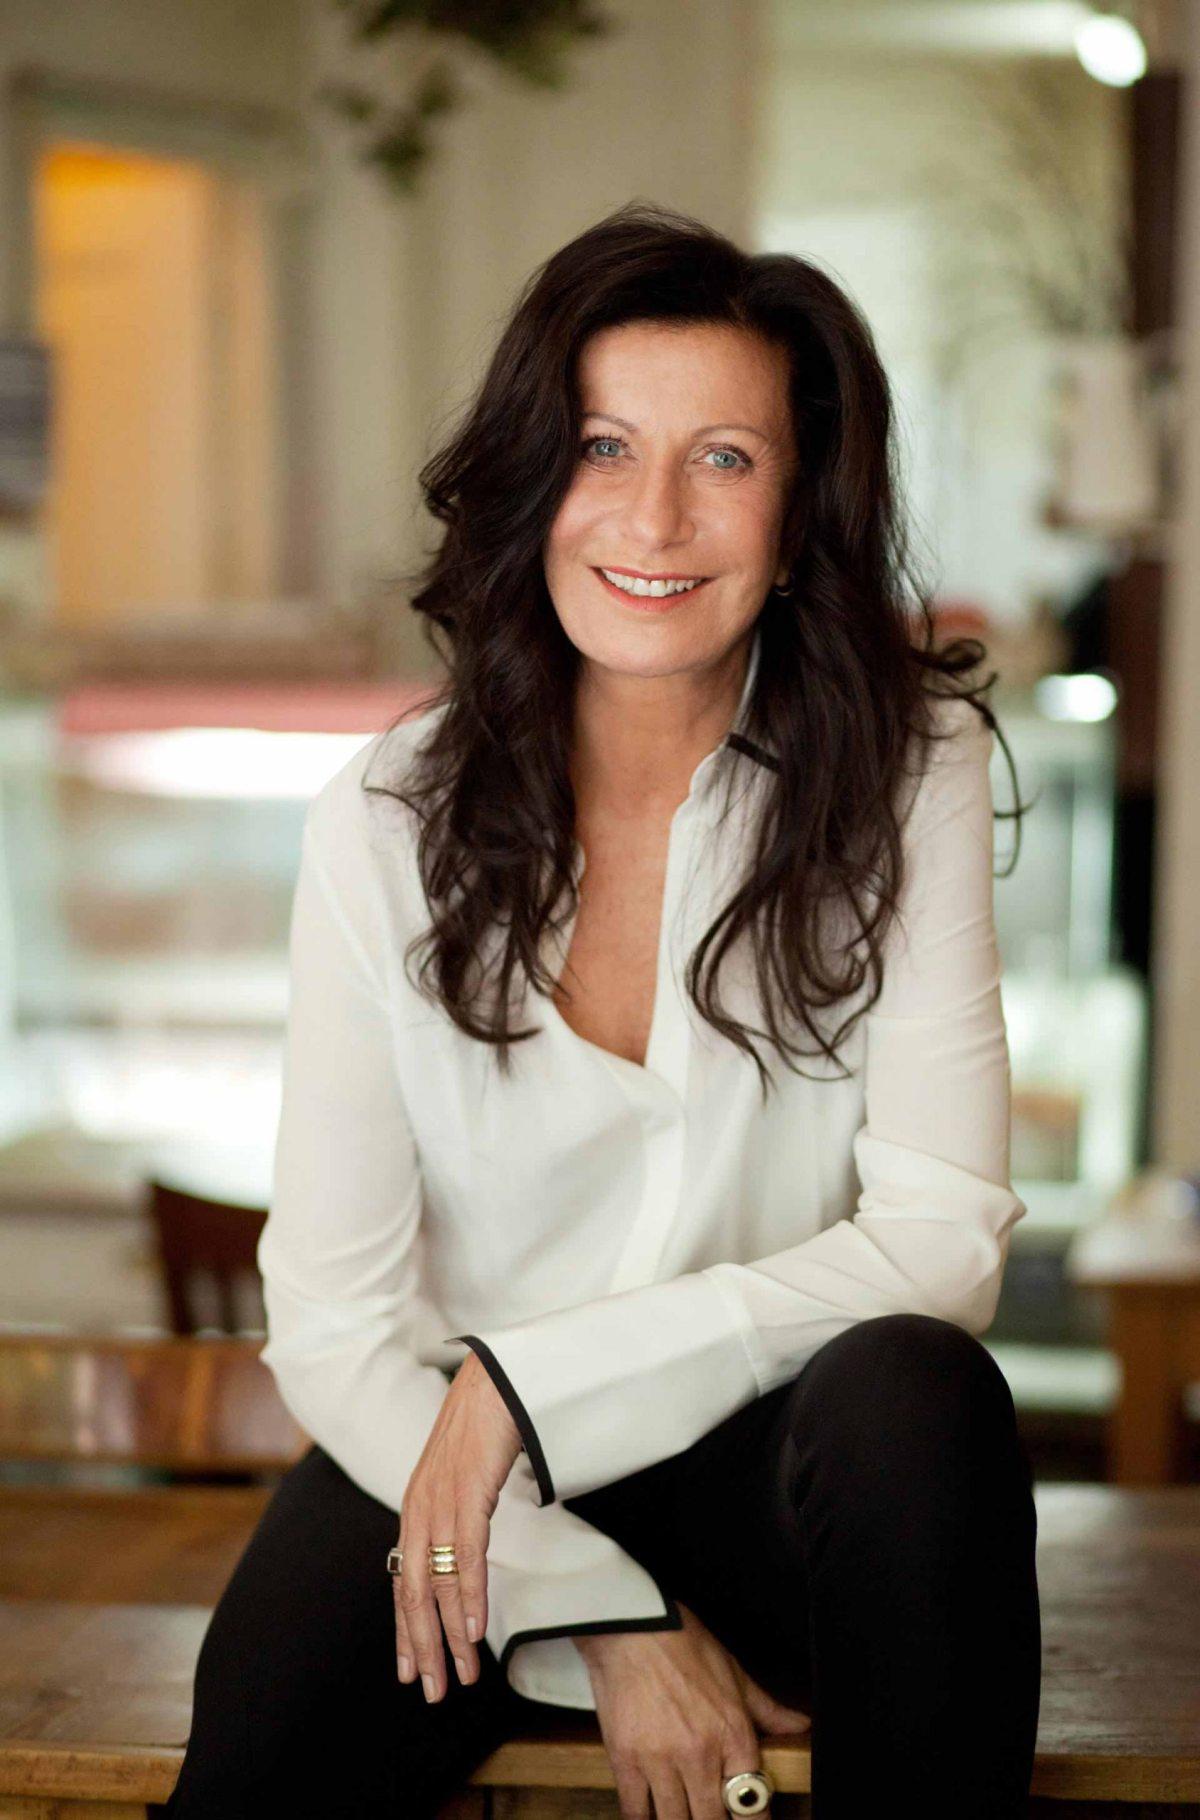 Patrizia Moresco